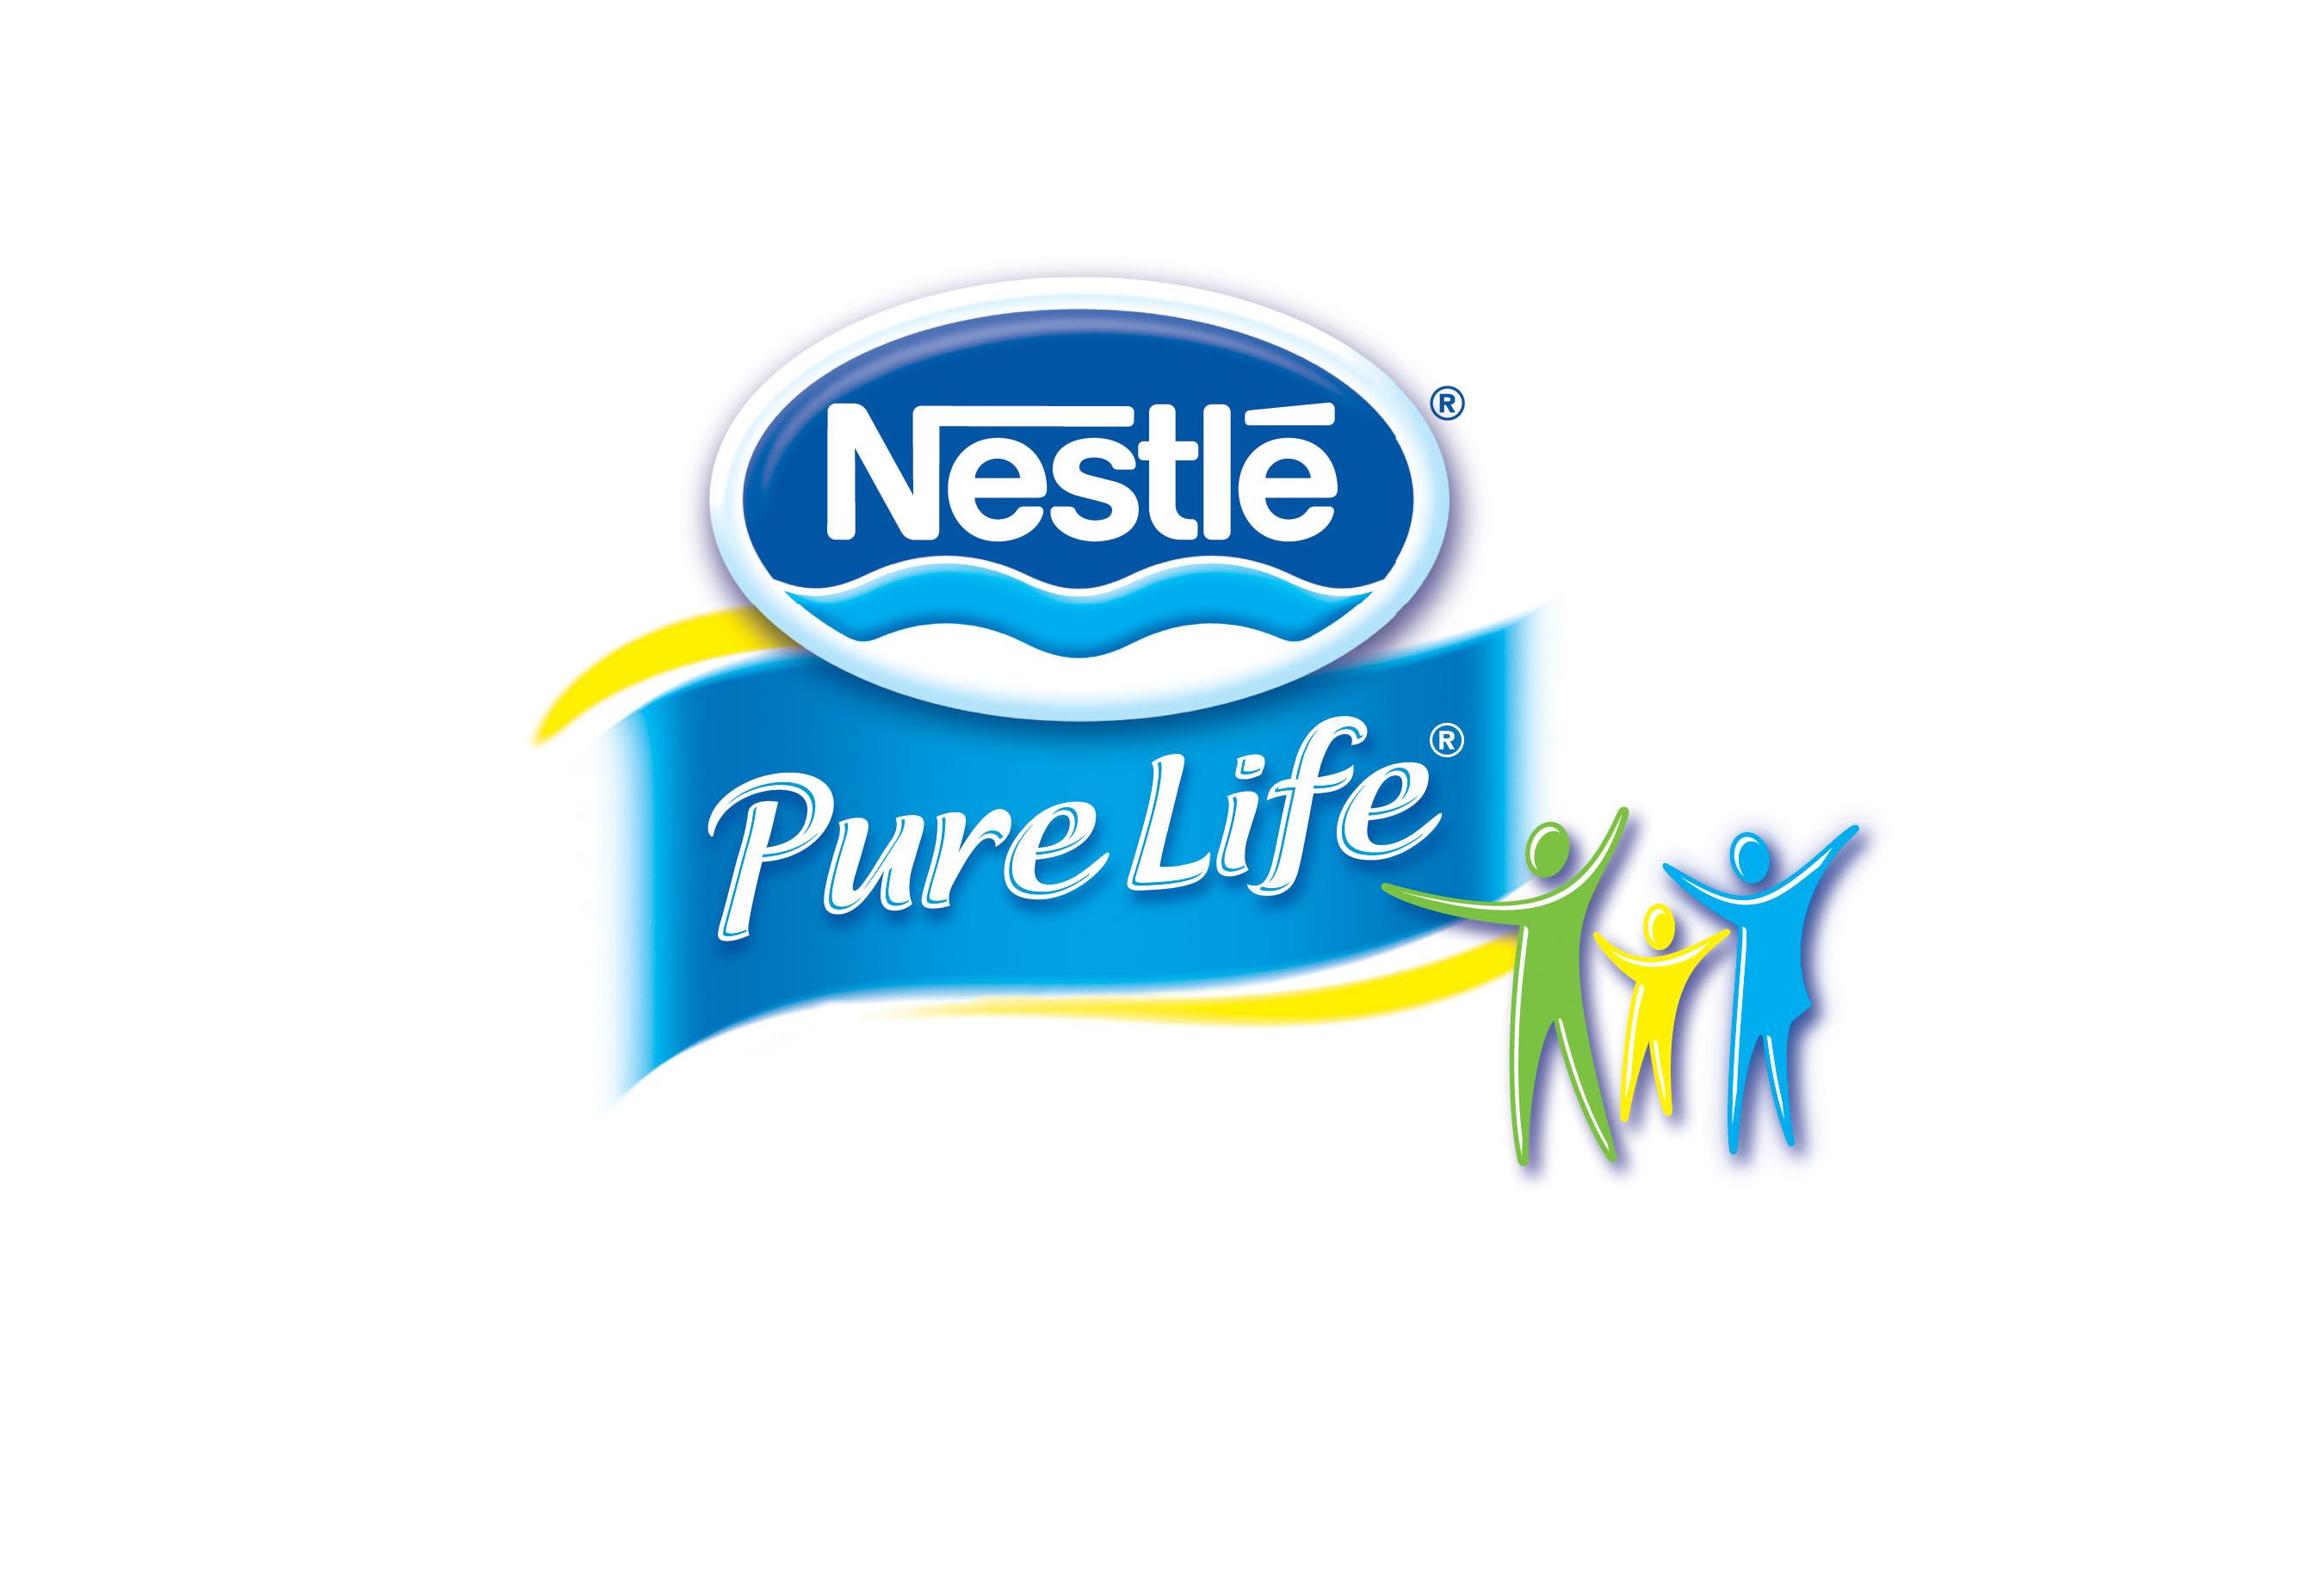 Nestlé® Pure Life® Launches Loyalty Program And Shares Valuable ...: hispanicprwire.com/en/nestle-pure-life-lanza-programa-de...